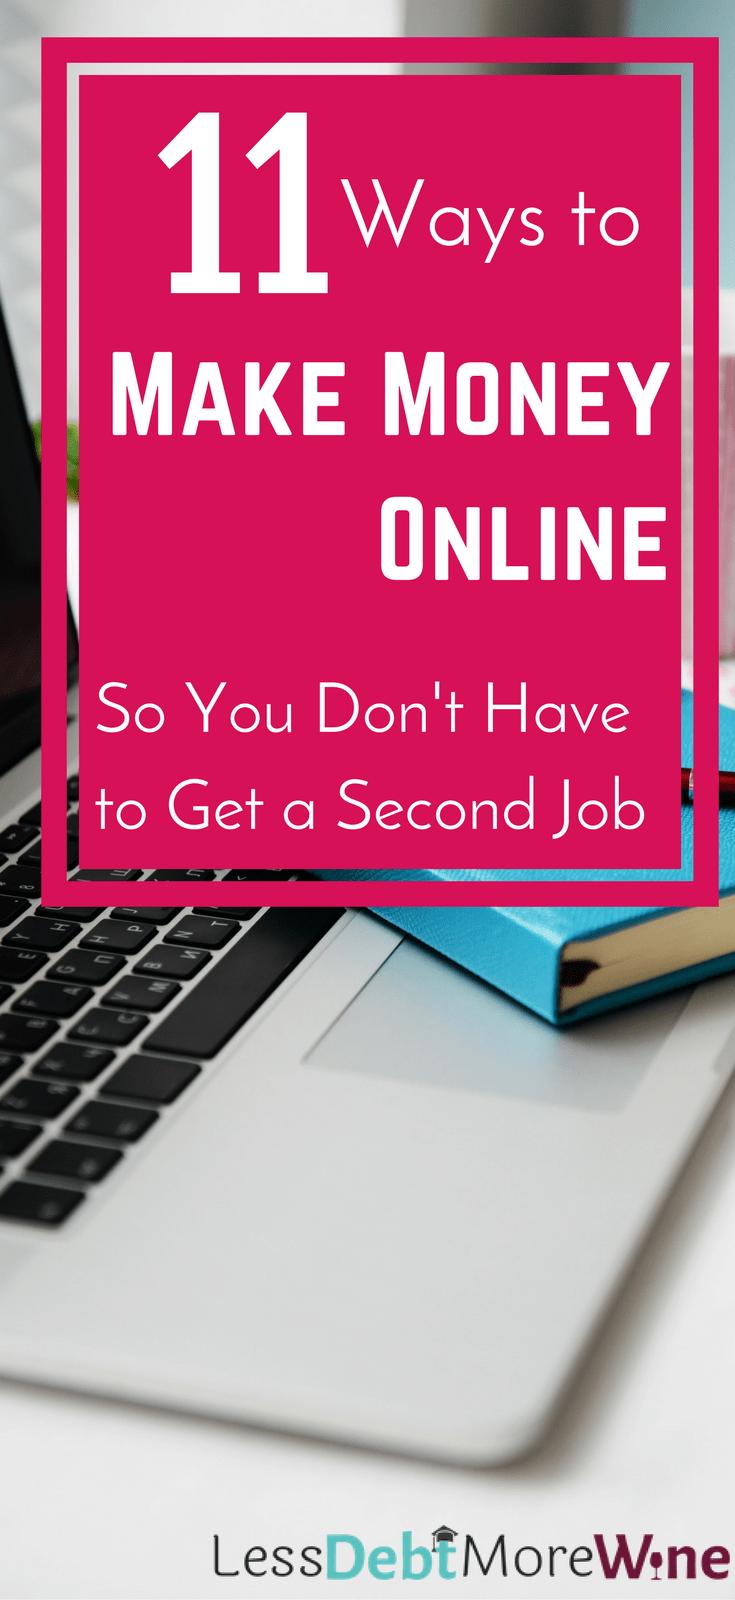 make money online | side hustle | earn extra money | make extra cash